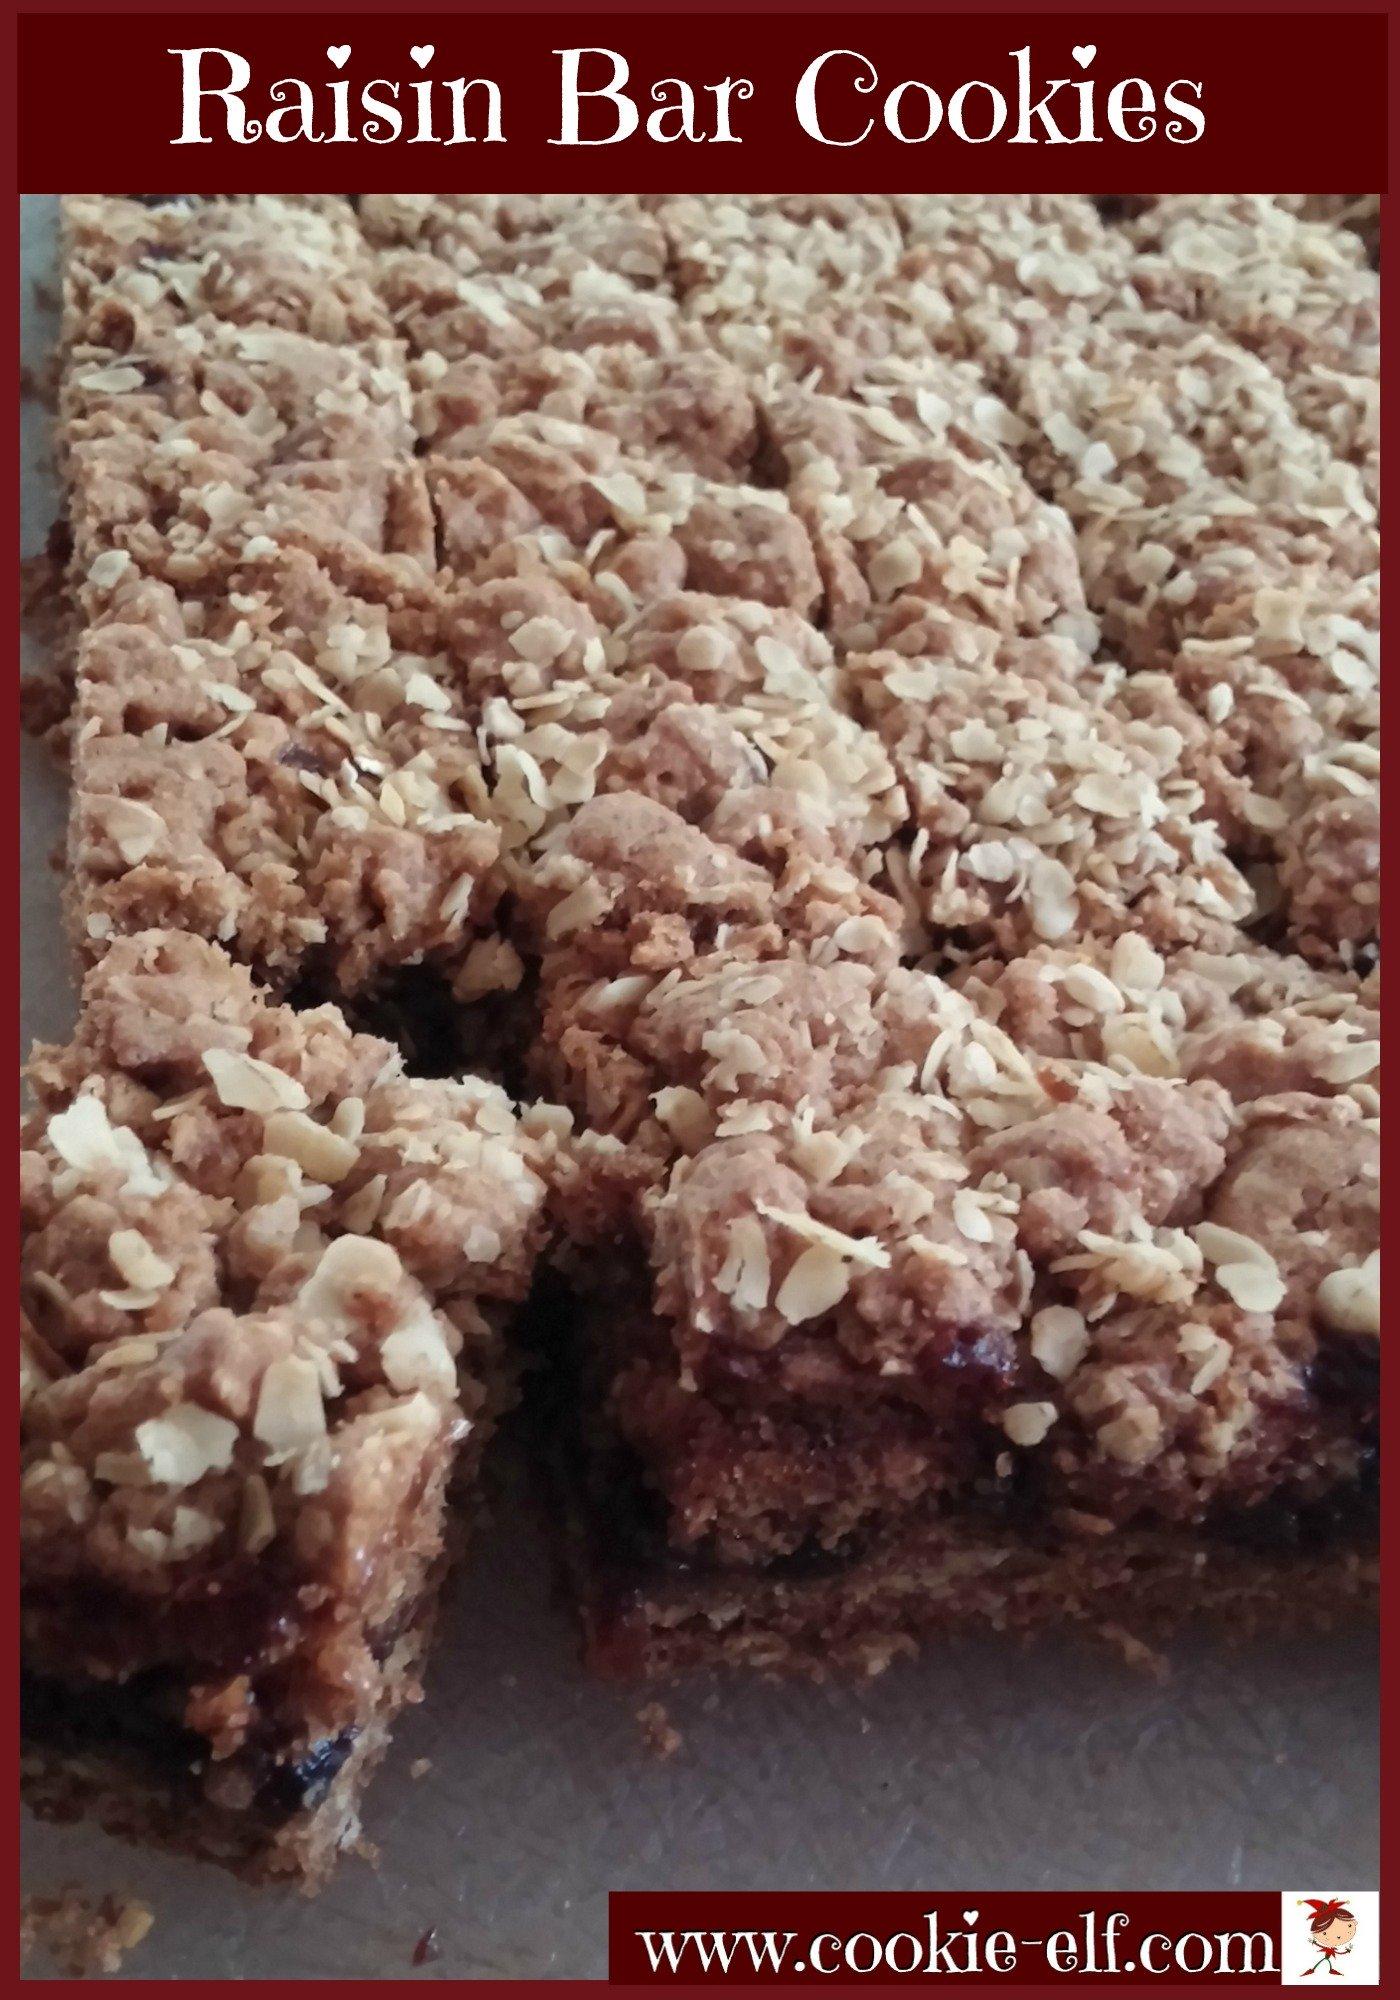 Raisin Bar Cookies from The Cookie Elf